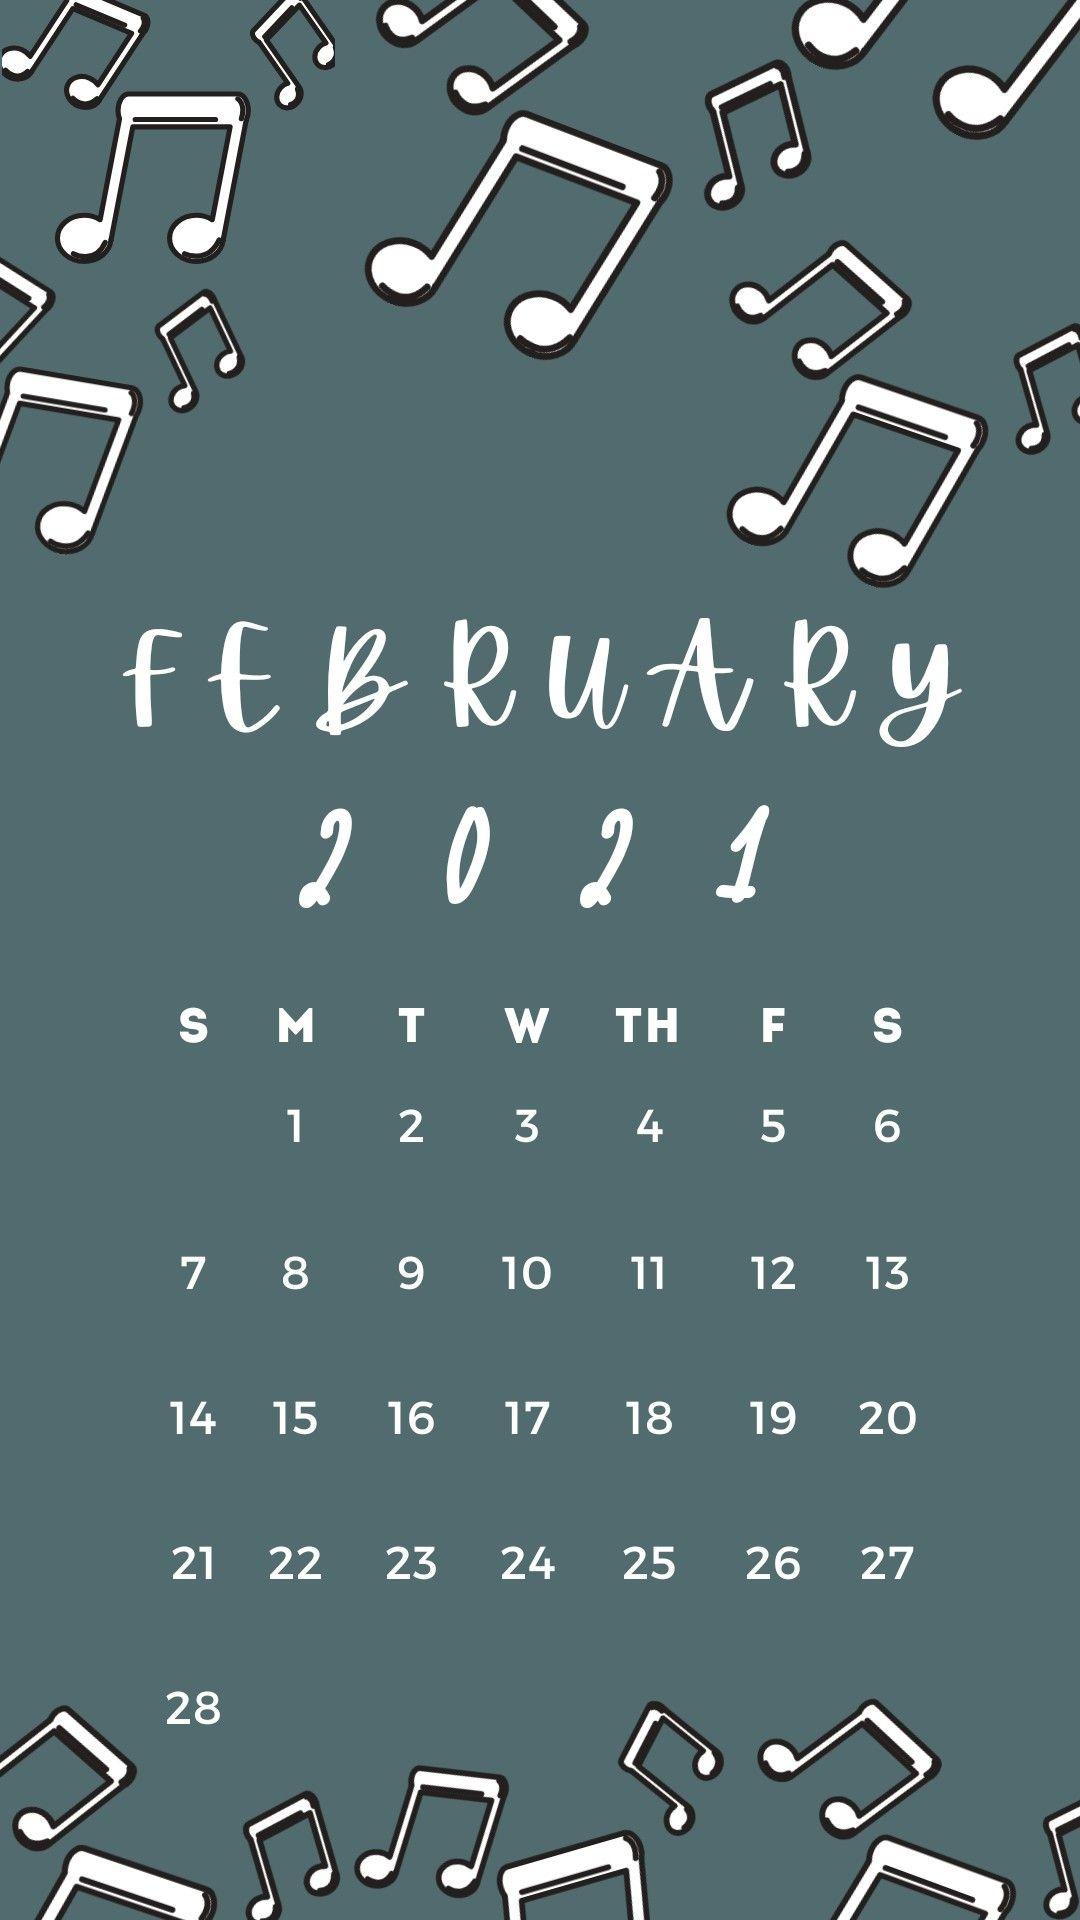 February 2021 Calendar Wallpaper In 2021 Calendar Wallpaper Calendar Wallpaper